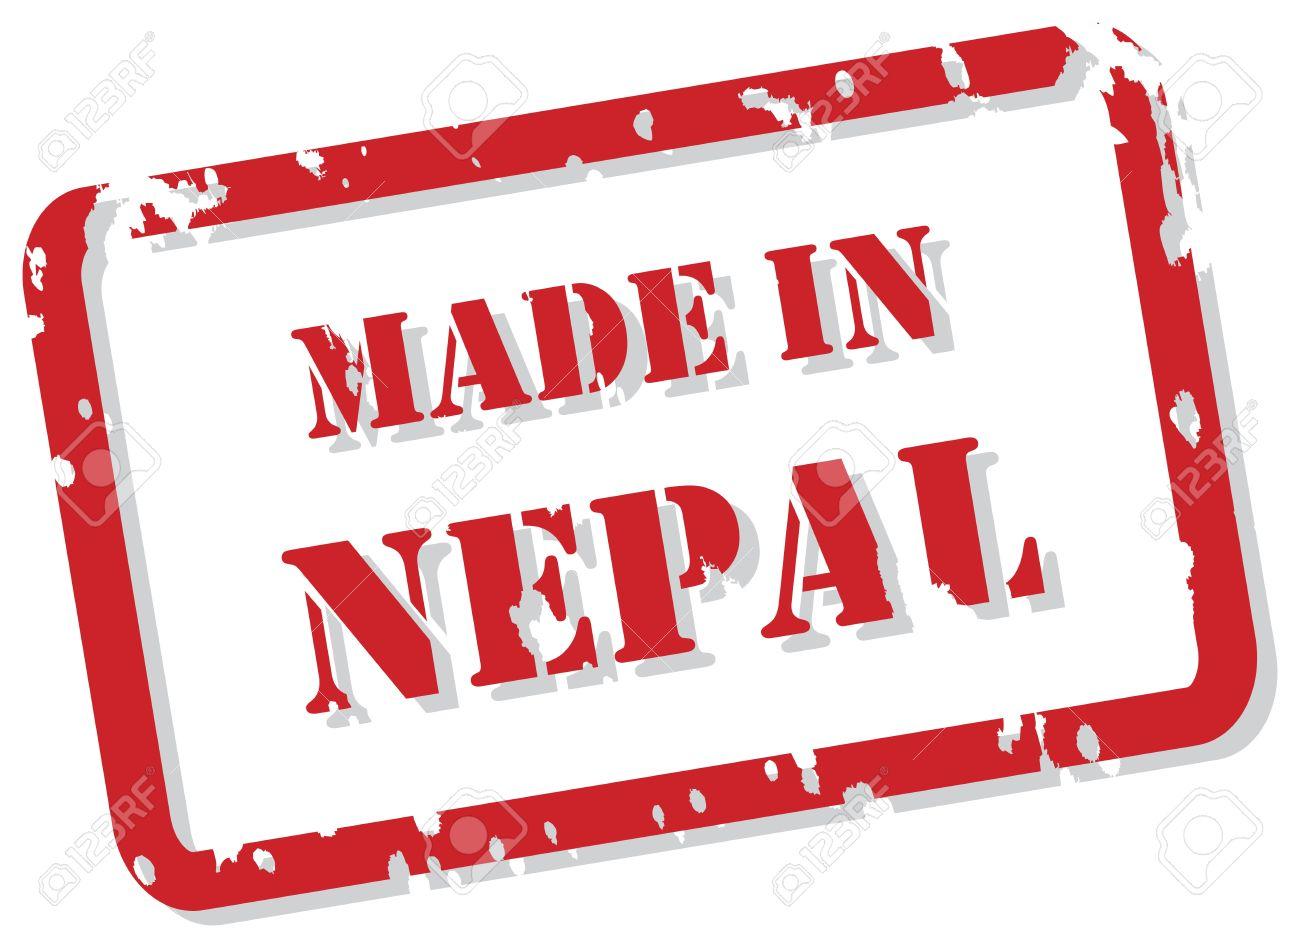 made_in_nepal-1491220467.jpg